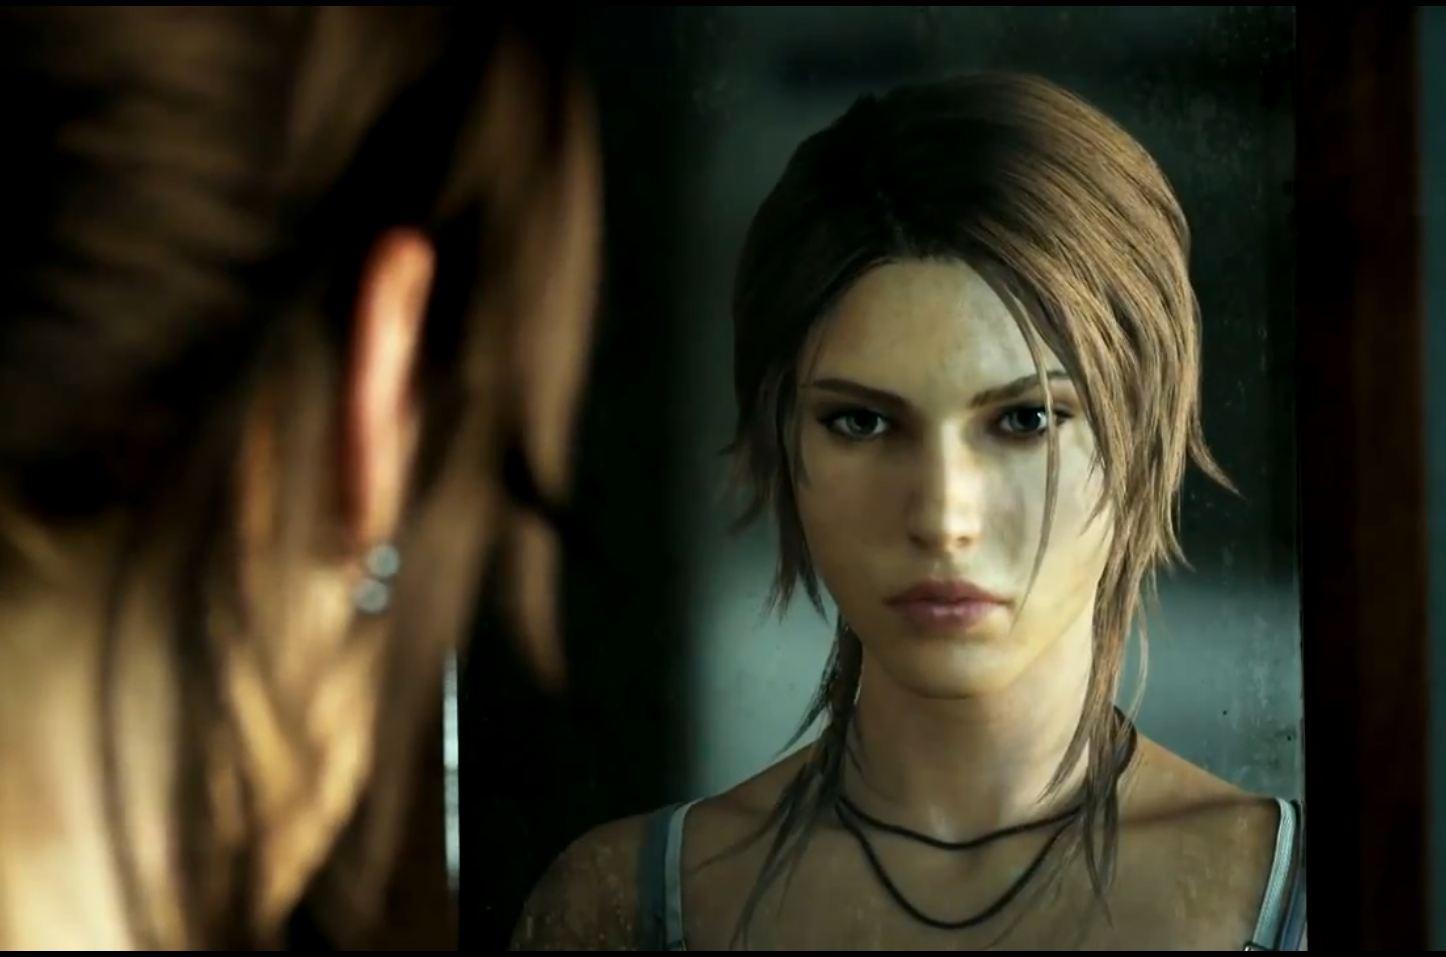 Tomb Raider sortie mars 2013 : Jaquette dévoilé  New-Tomb-Raider-2012-game-CG-movie